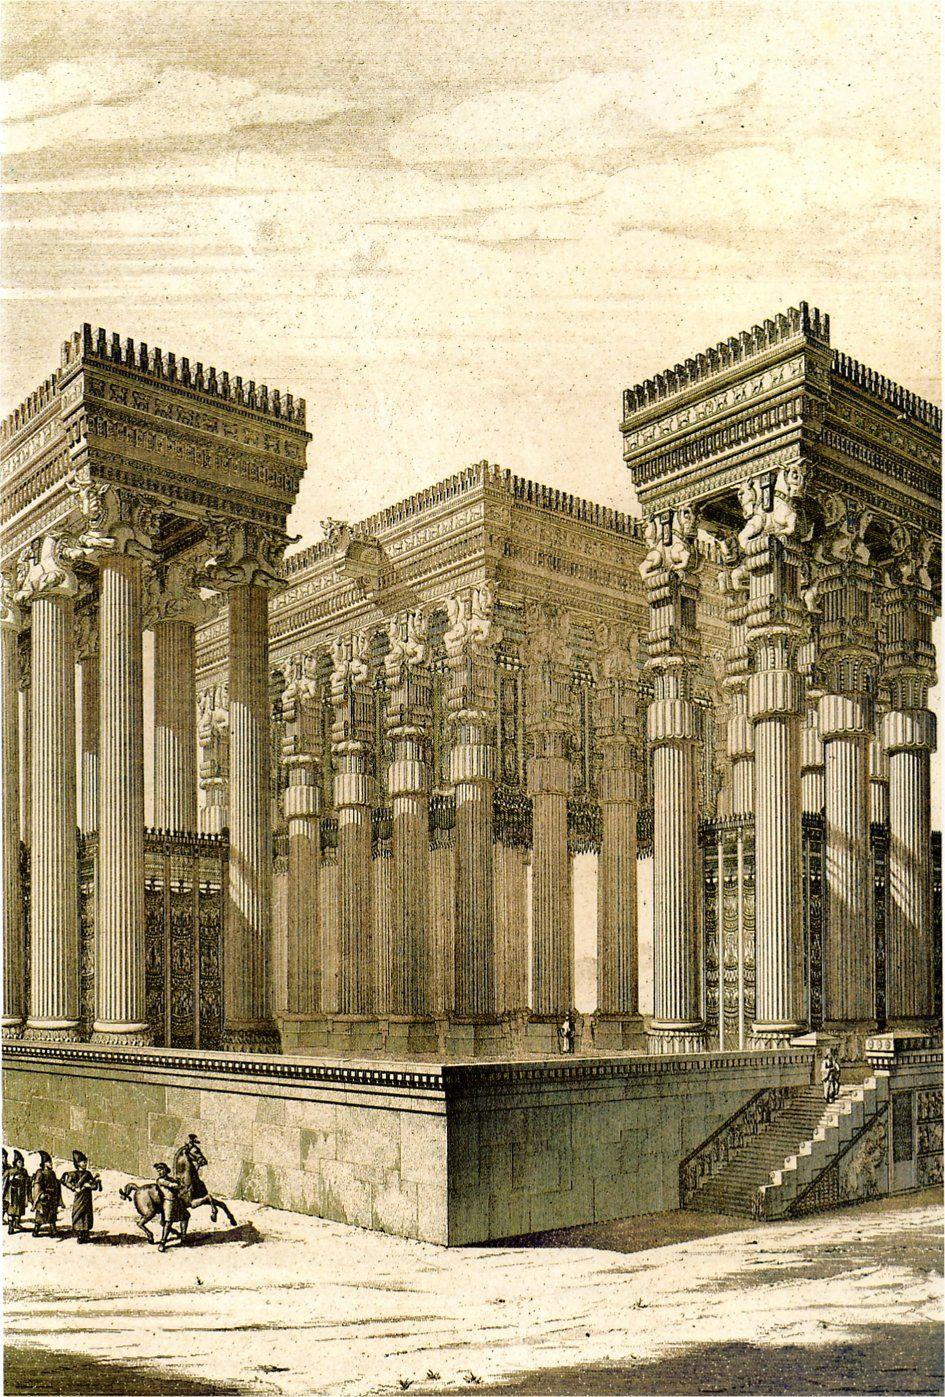 Best Kitchen Gallery: Persepolis Reconstruction Apadana Chipiez … Pinteres… of Ancient Persian Architecture on rachelxblog.com